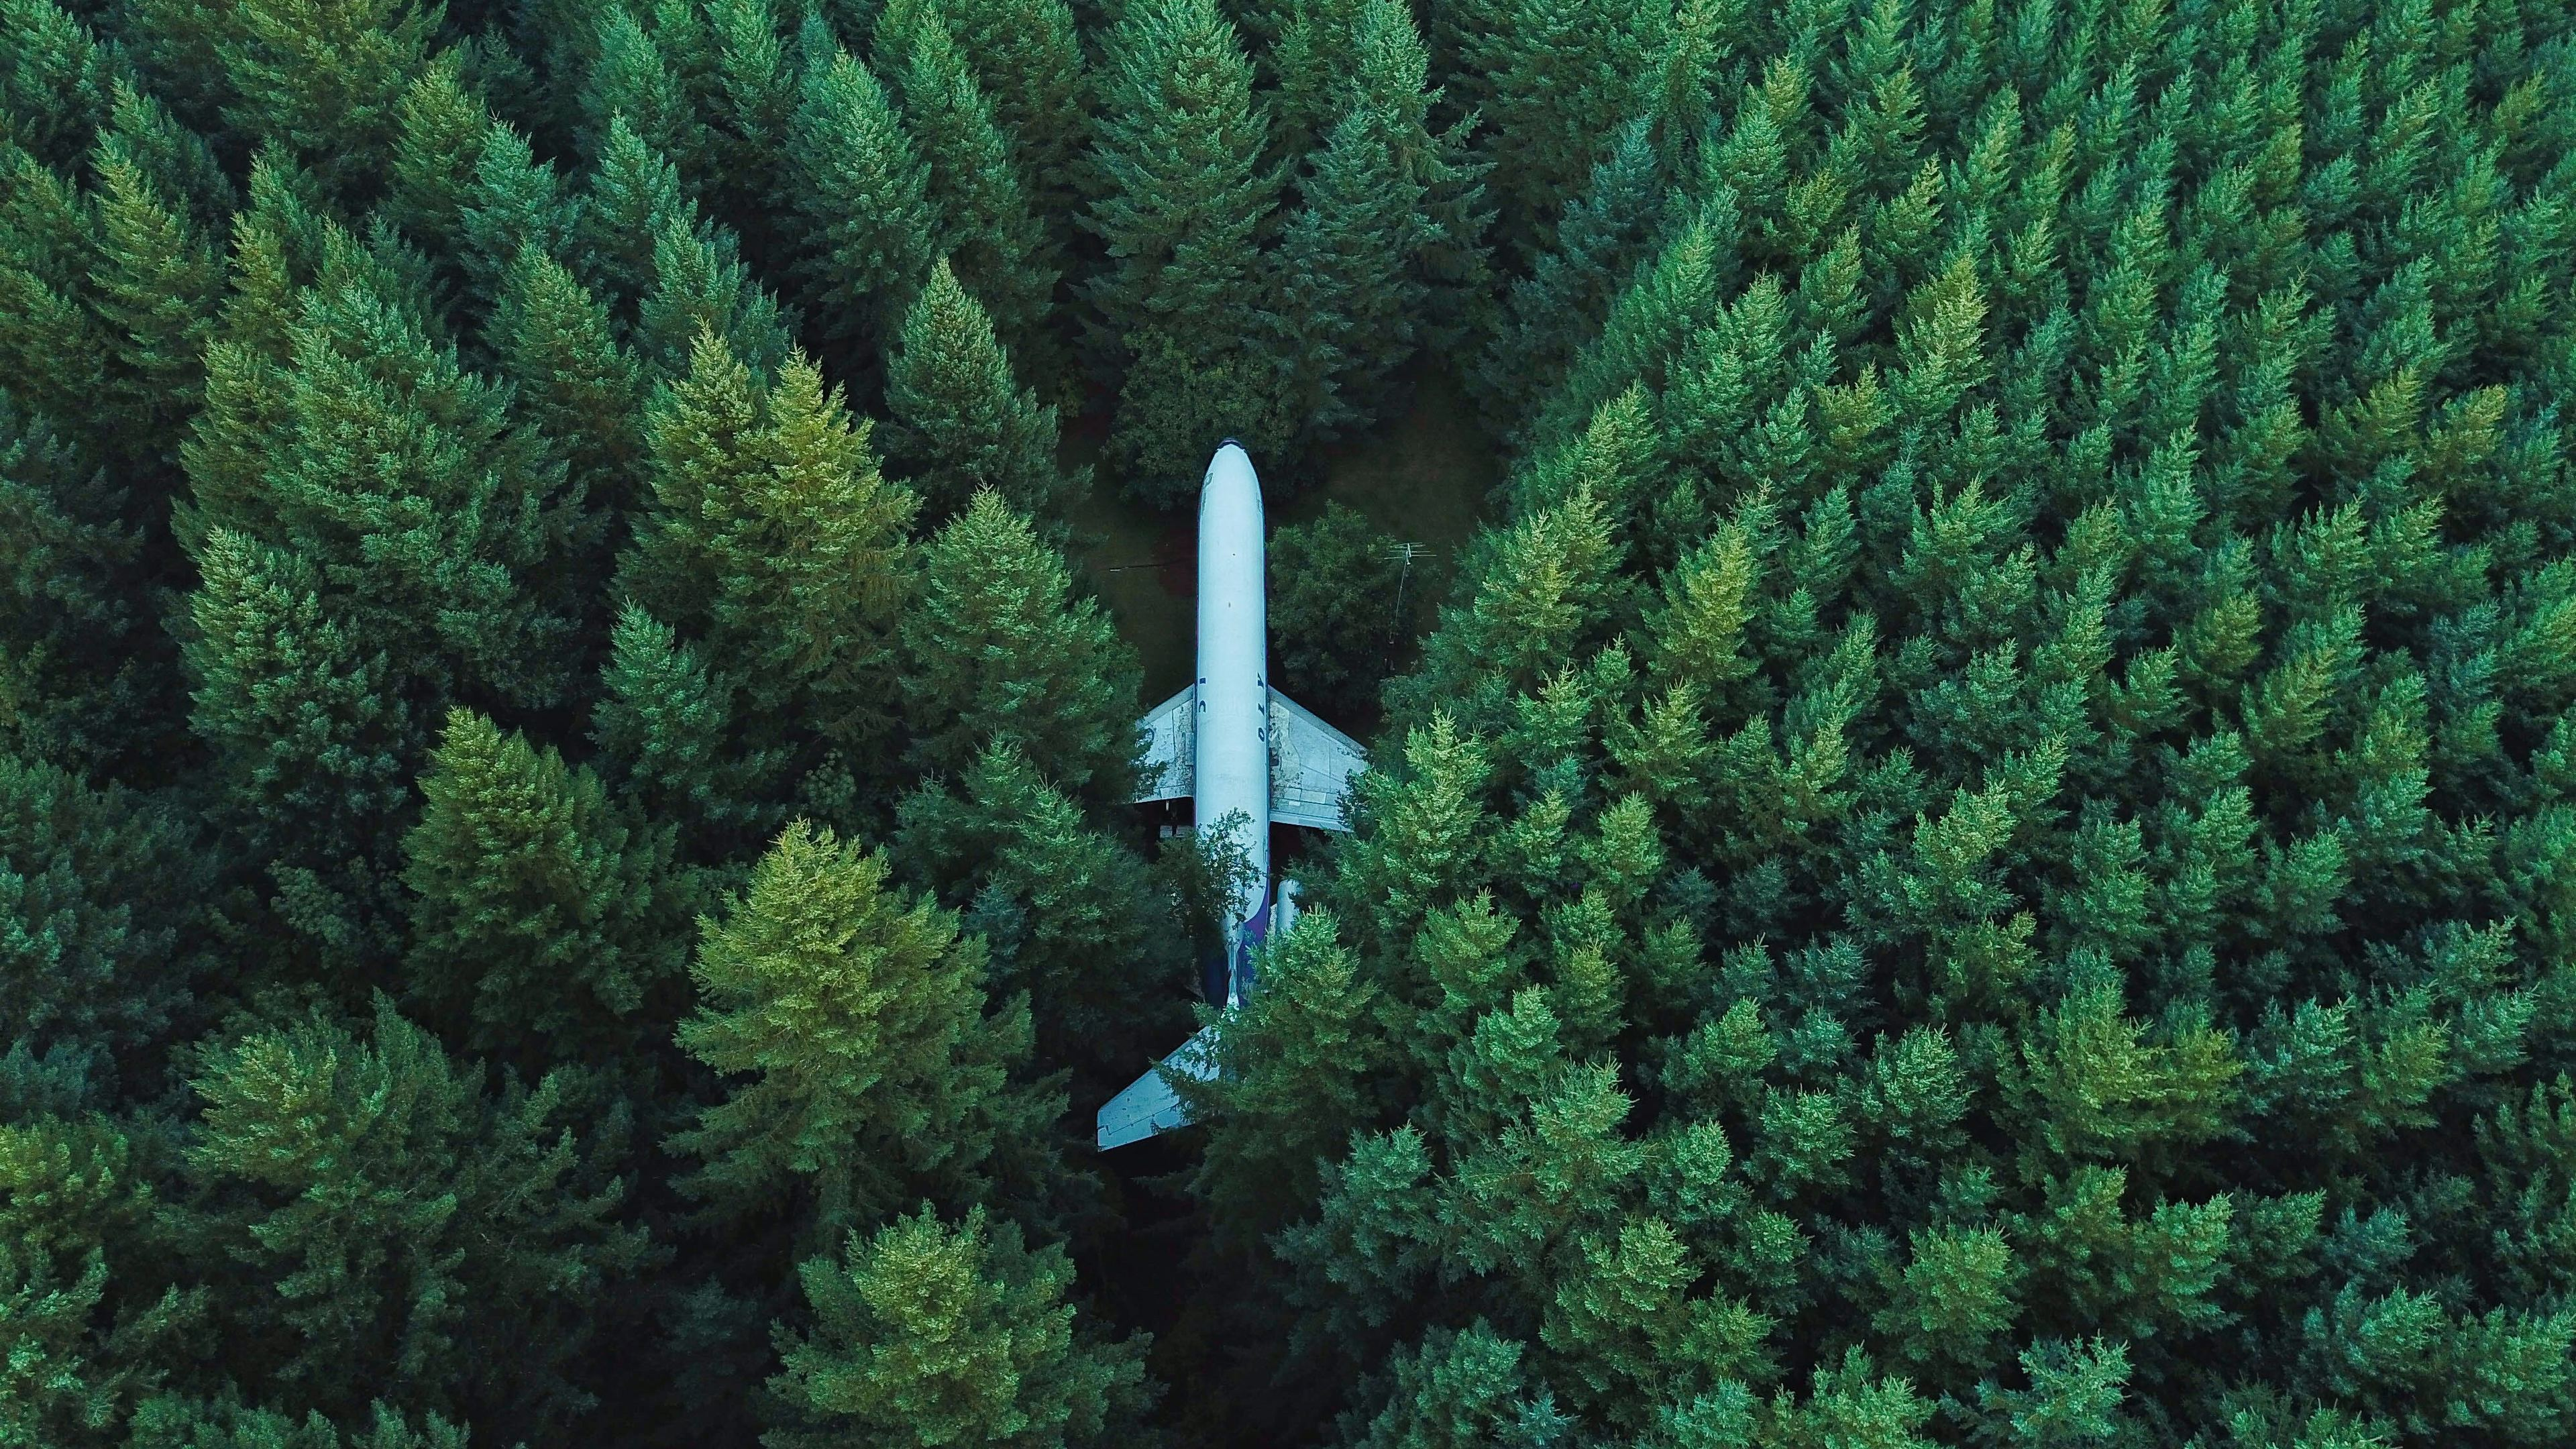 Wallpaper 4k Plane In Middle Of Forest 4k 4k Wallpapers Forest Wallpapers Hd Wallpapers Nature Wallpapers Planes Wallpapers